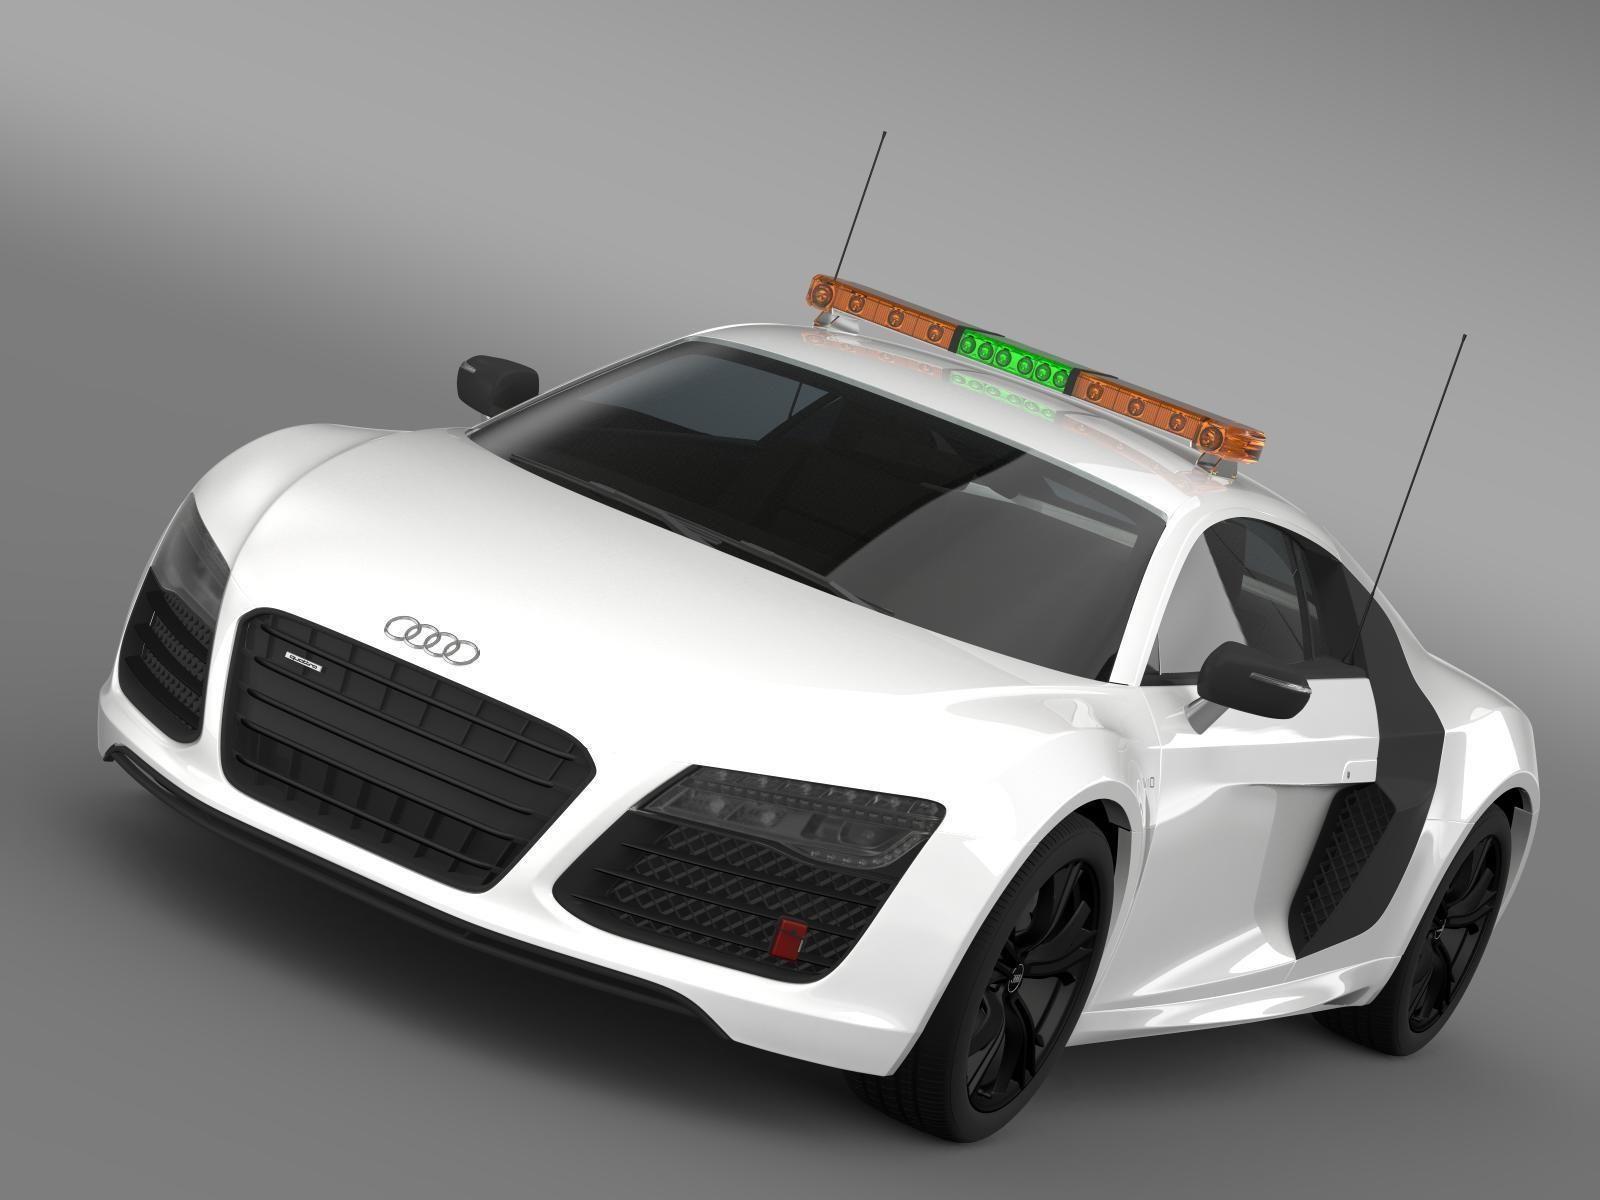 D Audi R Vplus Safety Car CGTrader - Audi car 3d